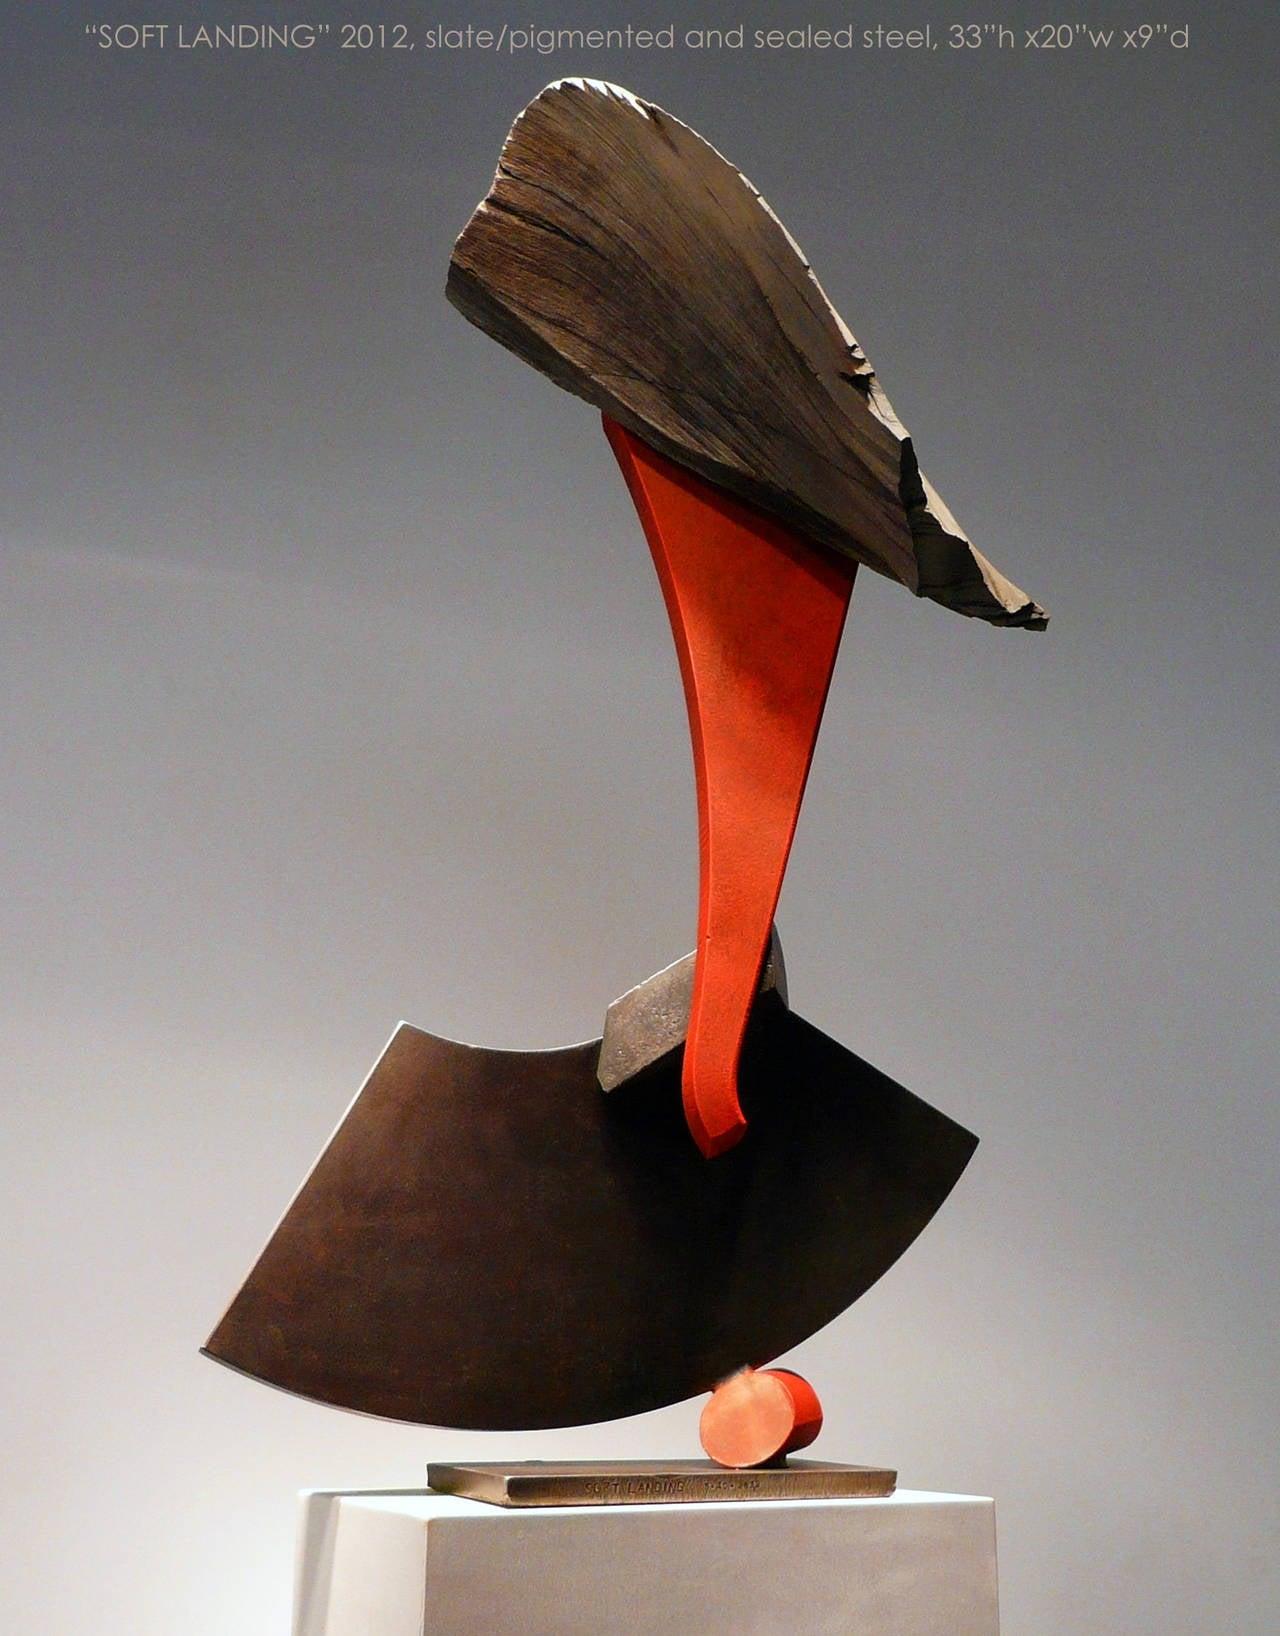 John Van Alstine Abstract Sculpture - Soft Landing